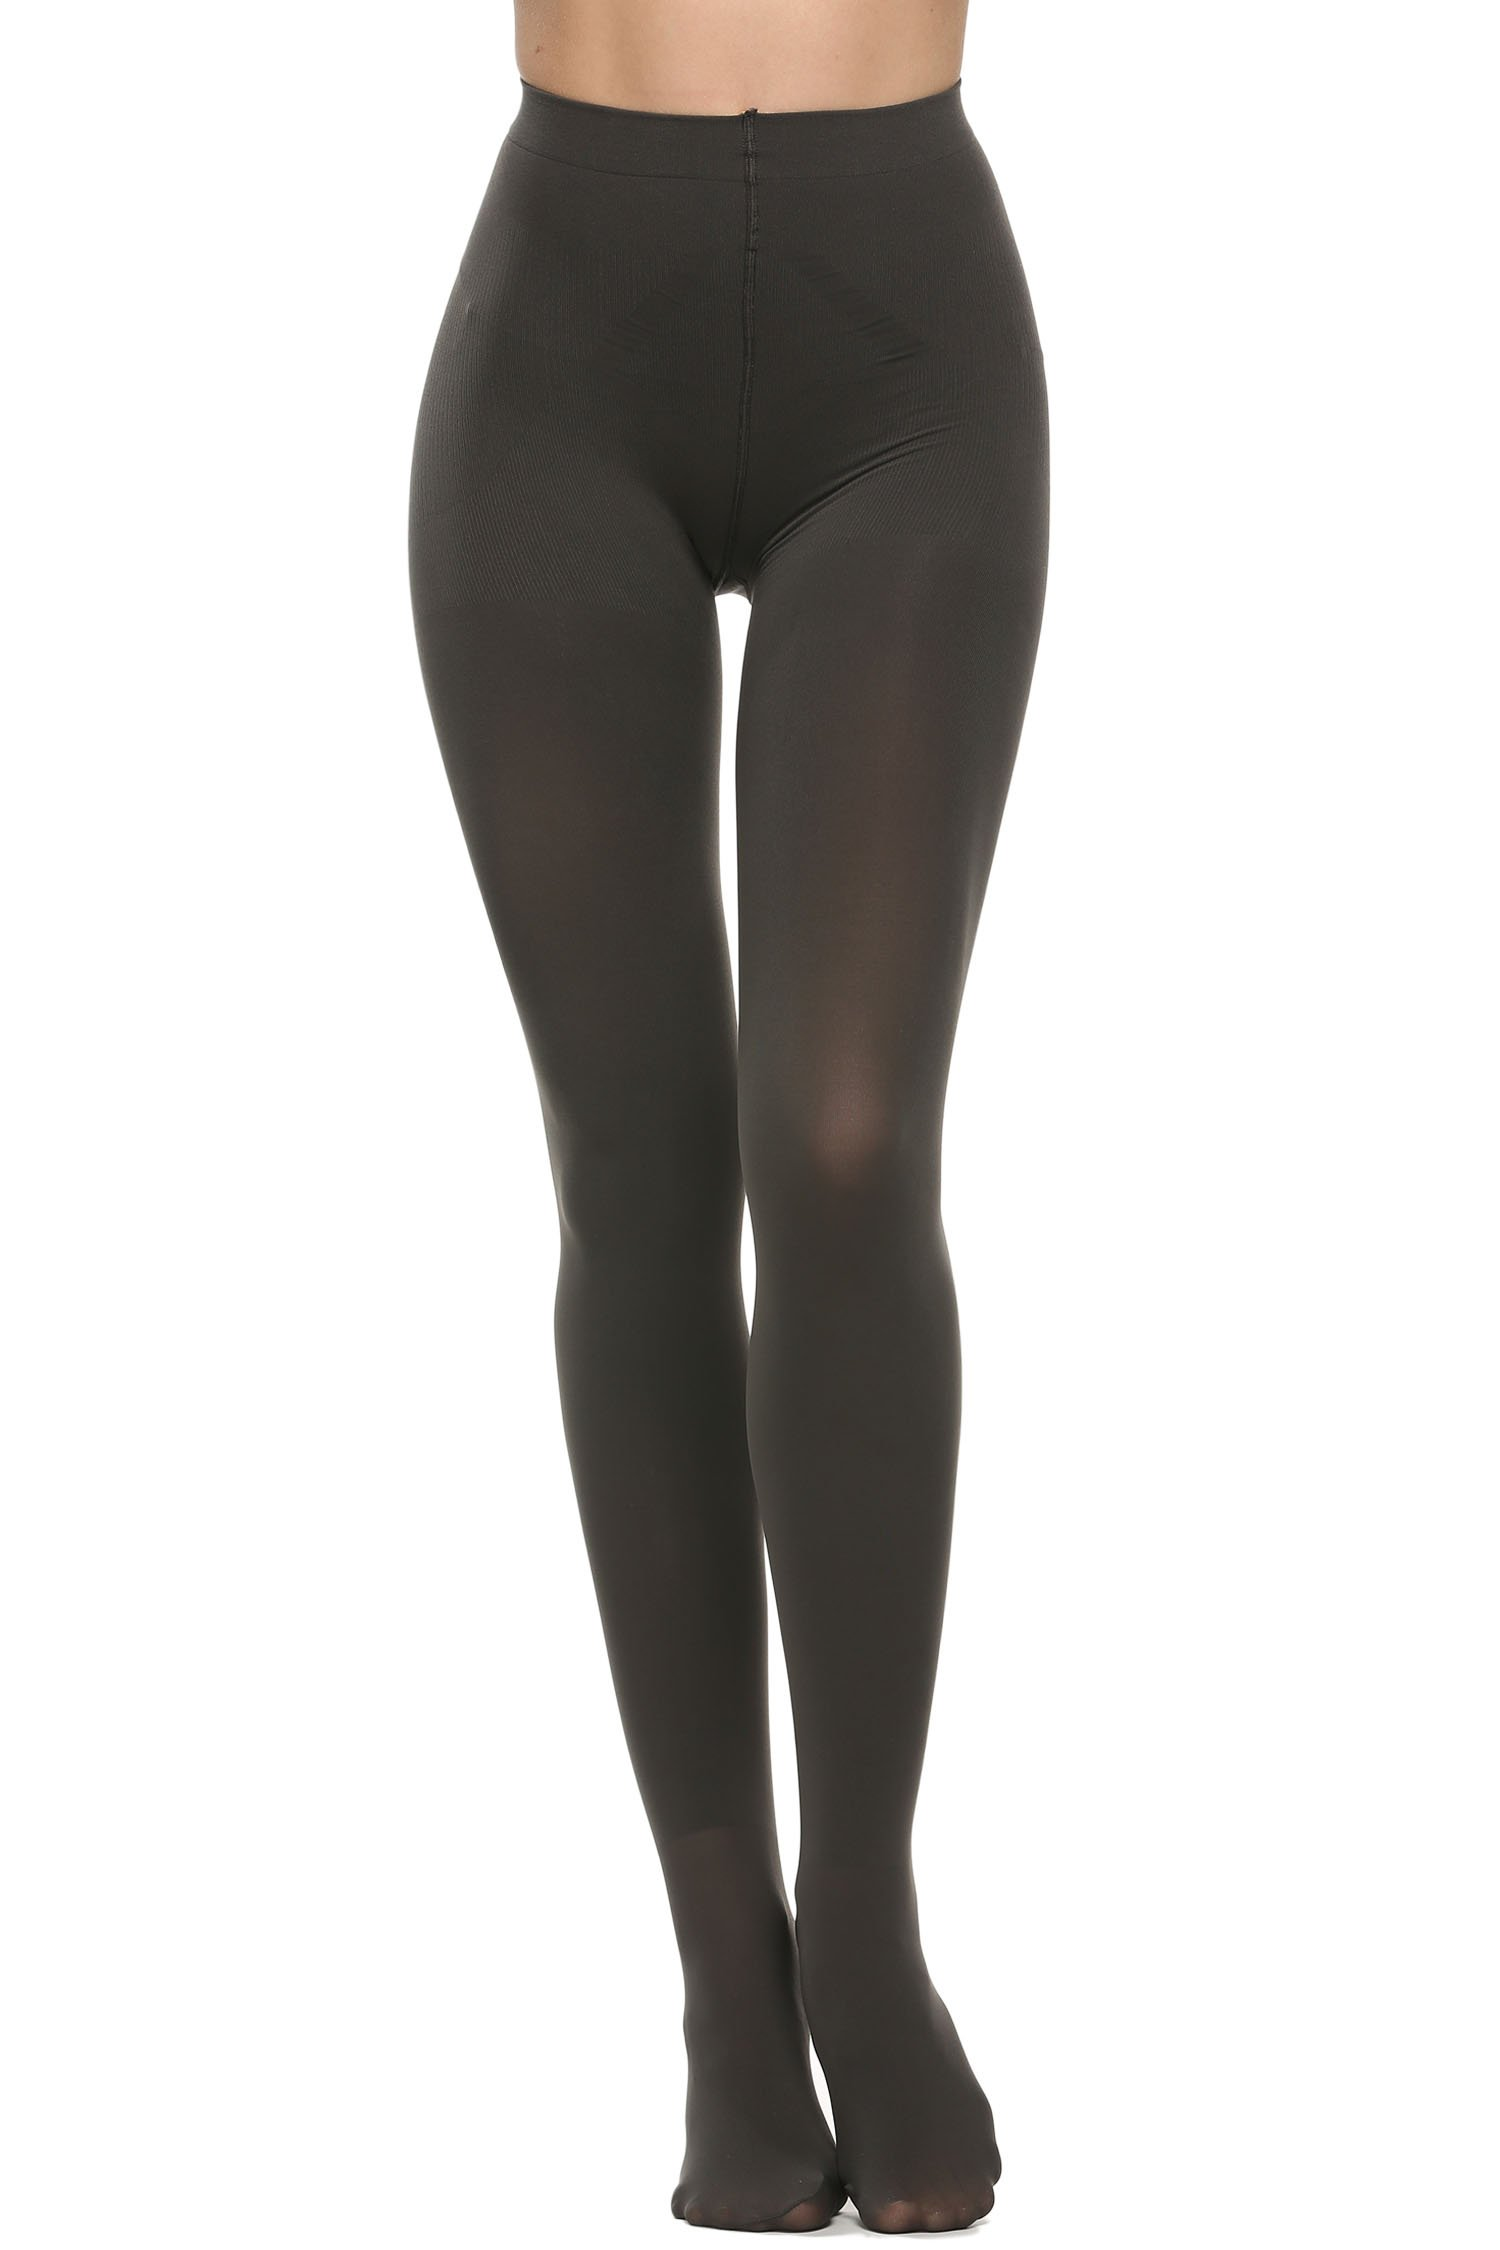 Avidlove Womens Socks Hosiery Control Top Tights Velvet Pantyhose 400 Denier (S, Dark Gray)